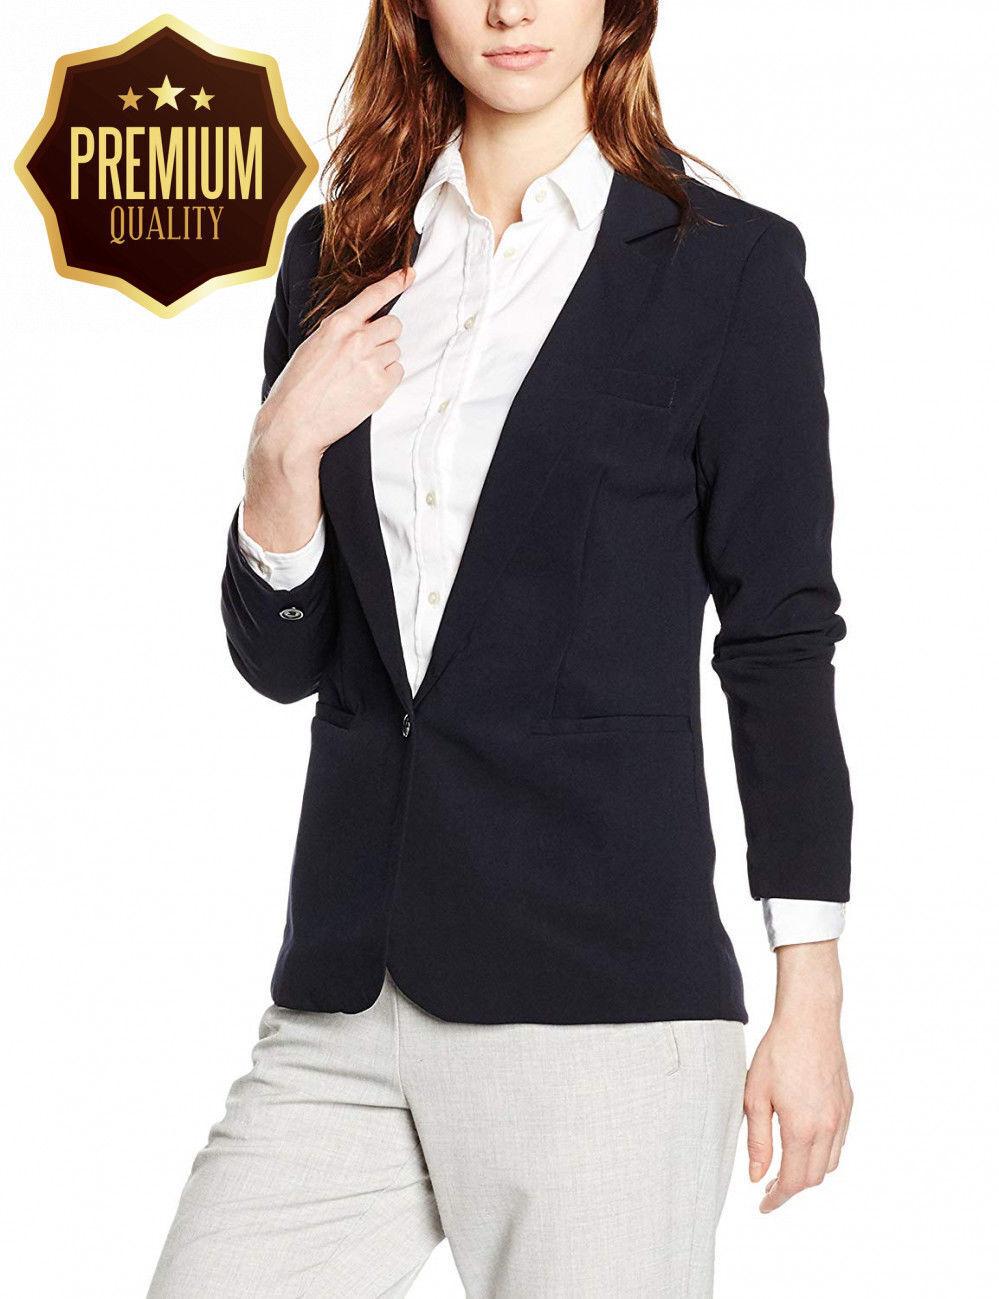 Unique 21 Womens Angie Plain Tailored Blazer Size 8 BNWT RRP .99 Dark Navy